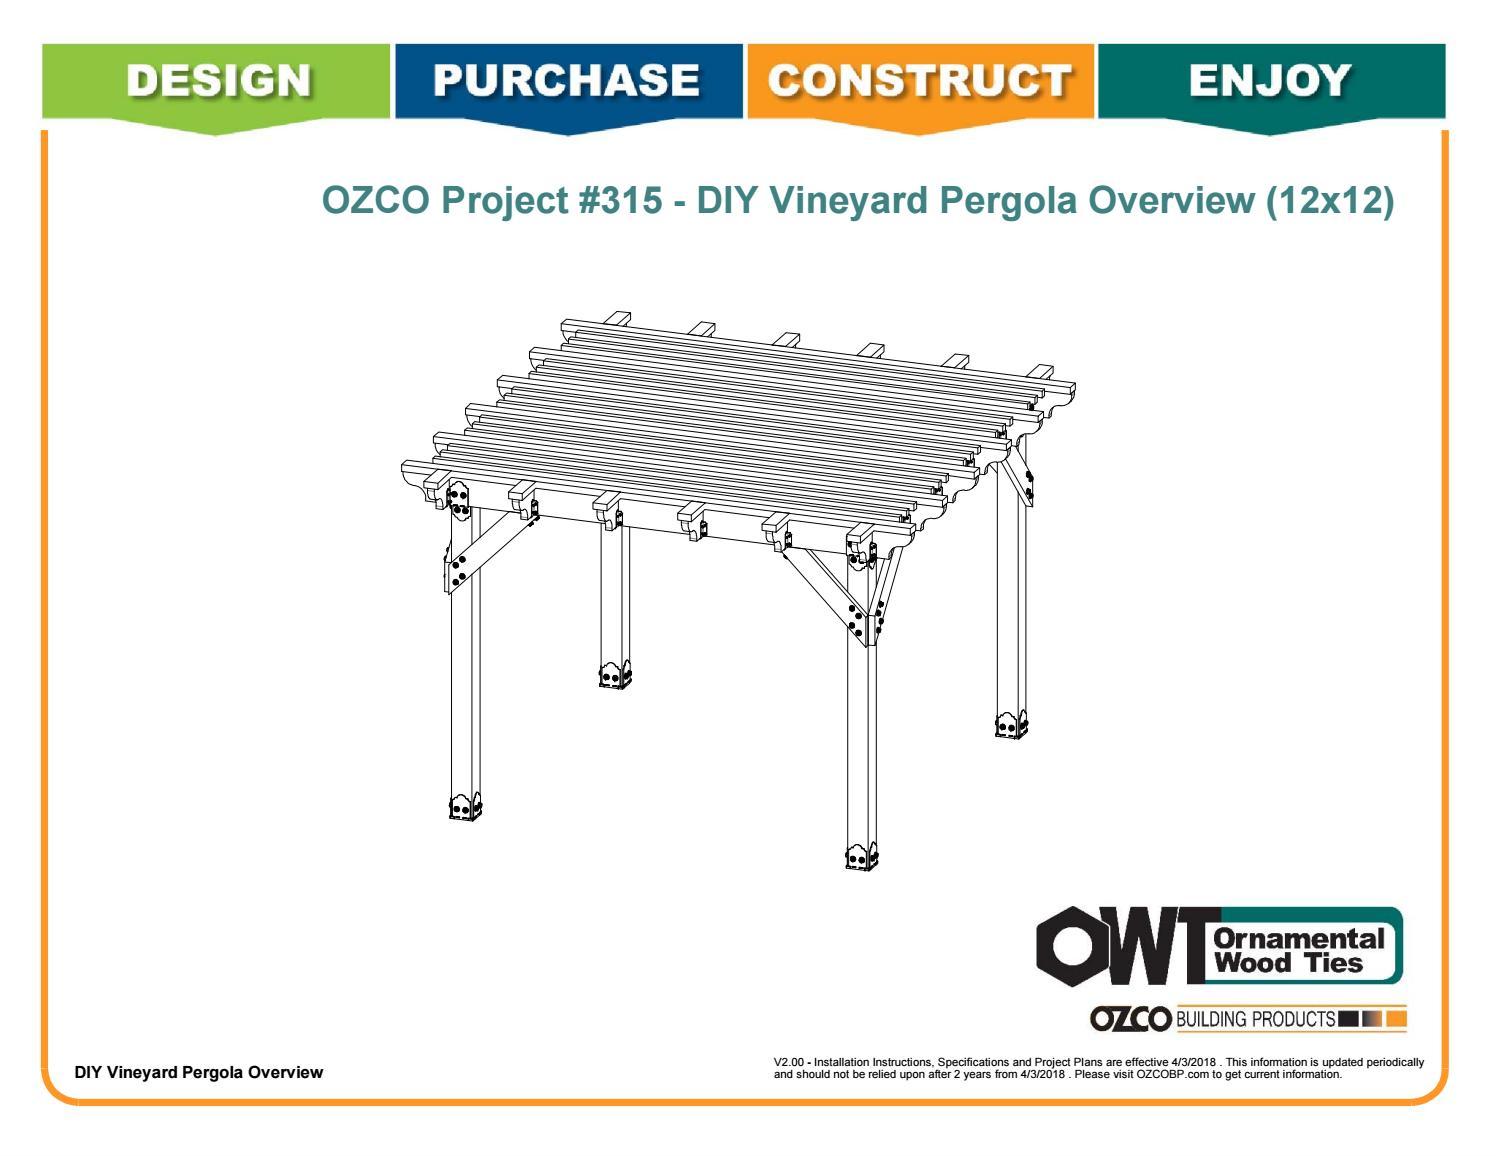 OZCO Project Arbor / Pergola Shade Patio Structure #315 by